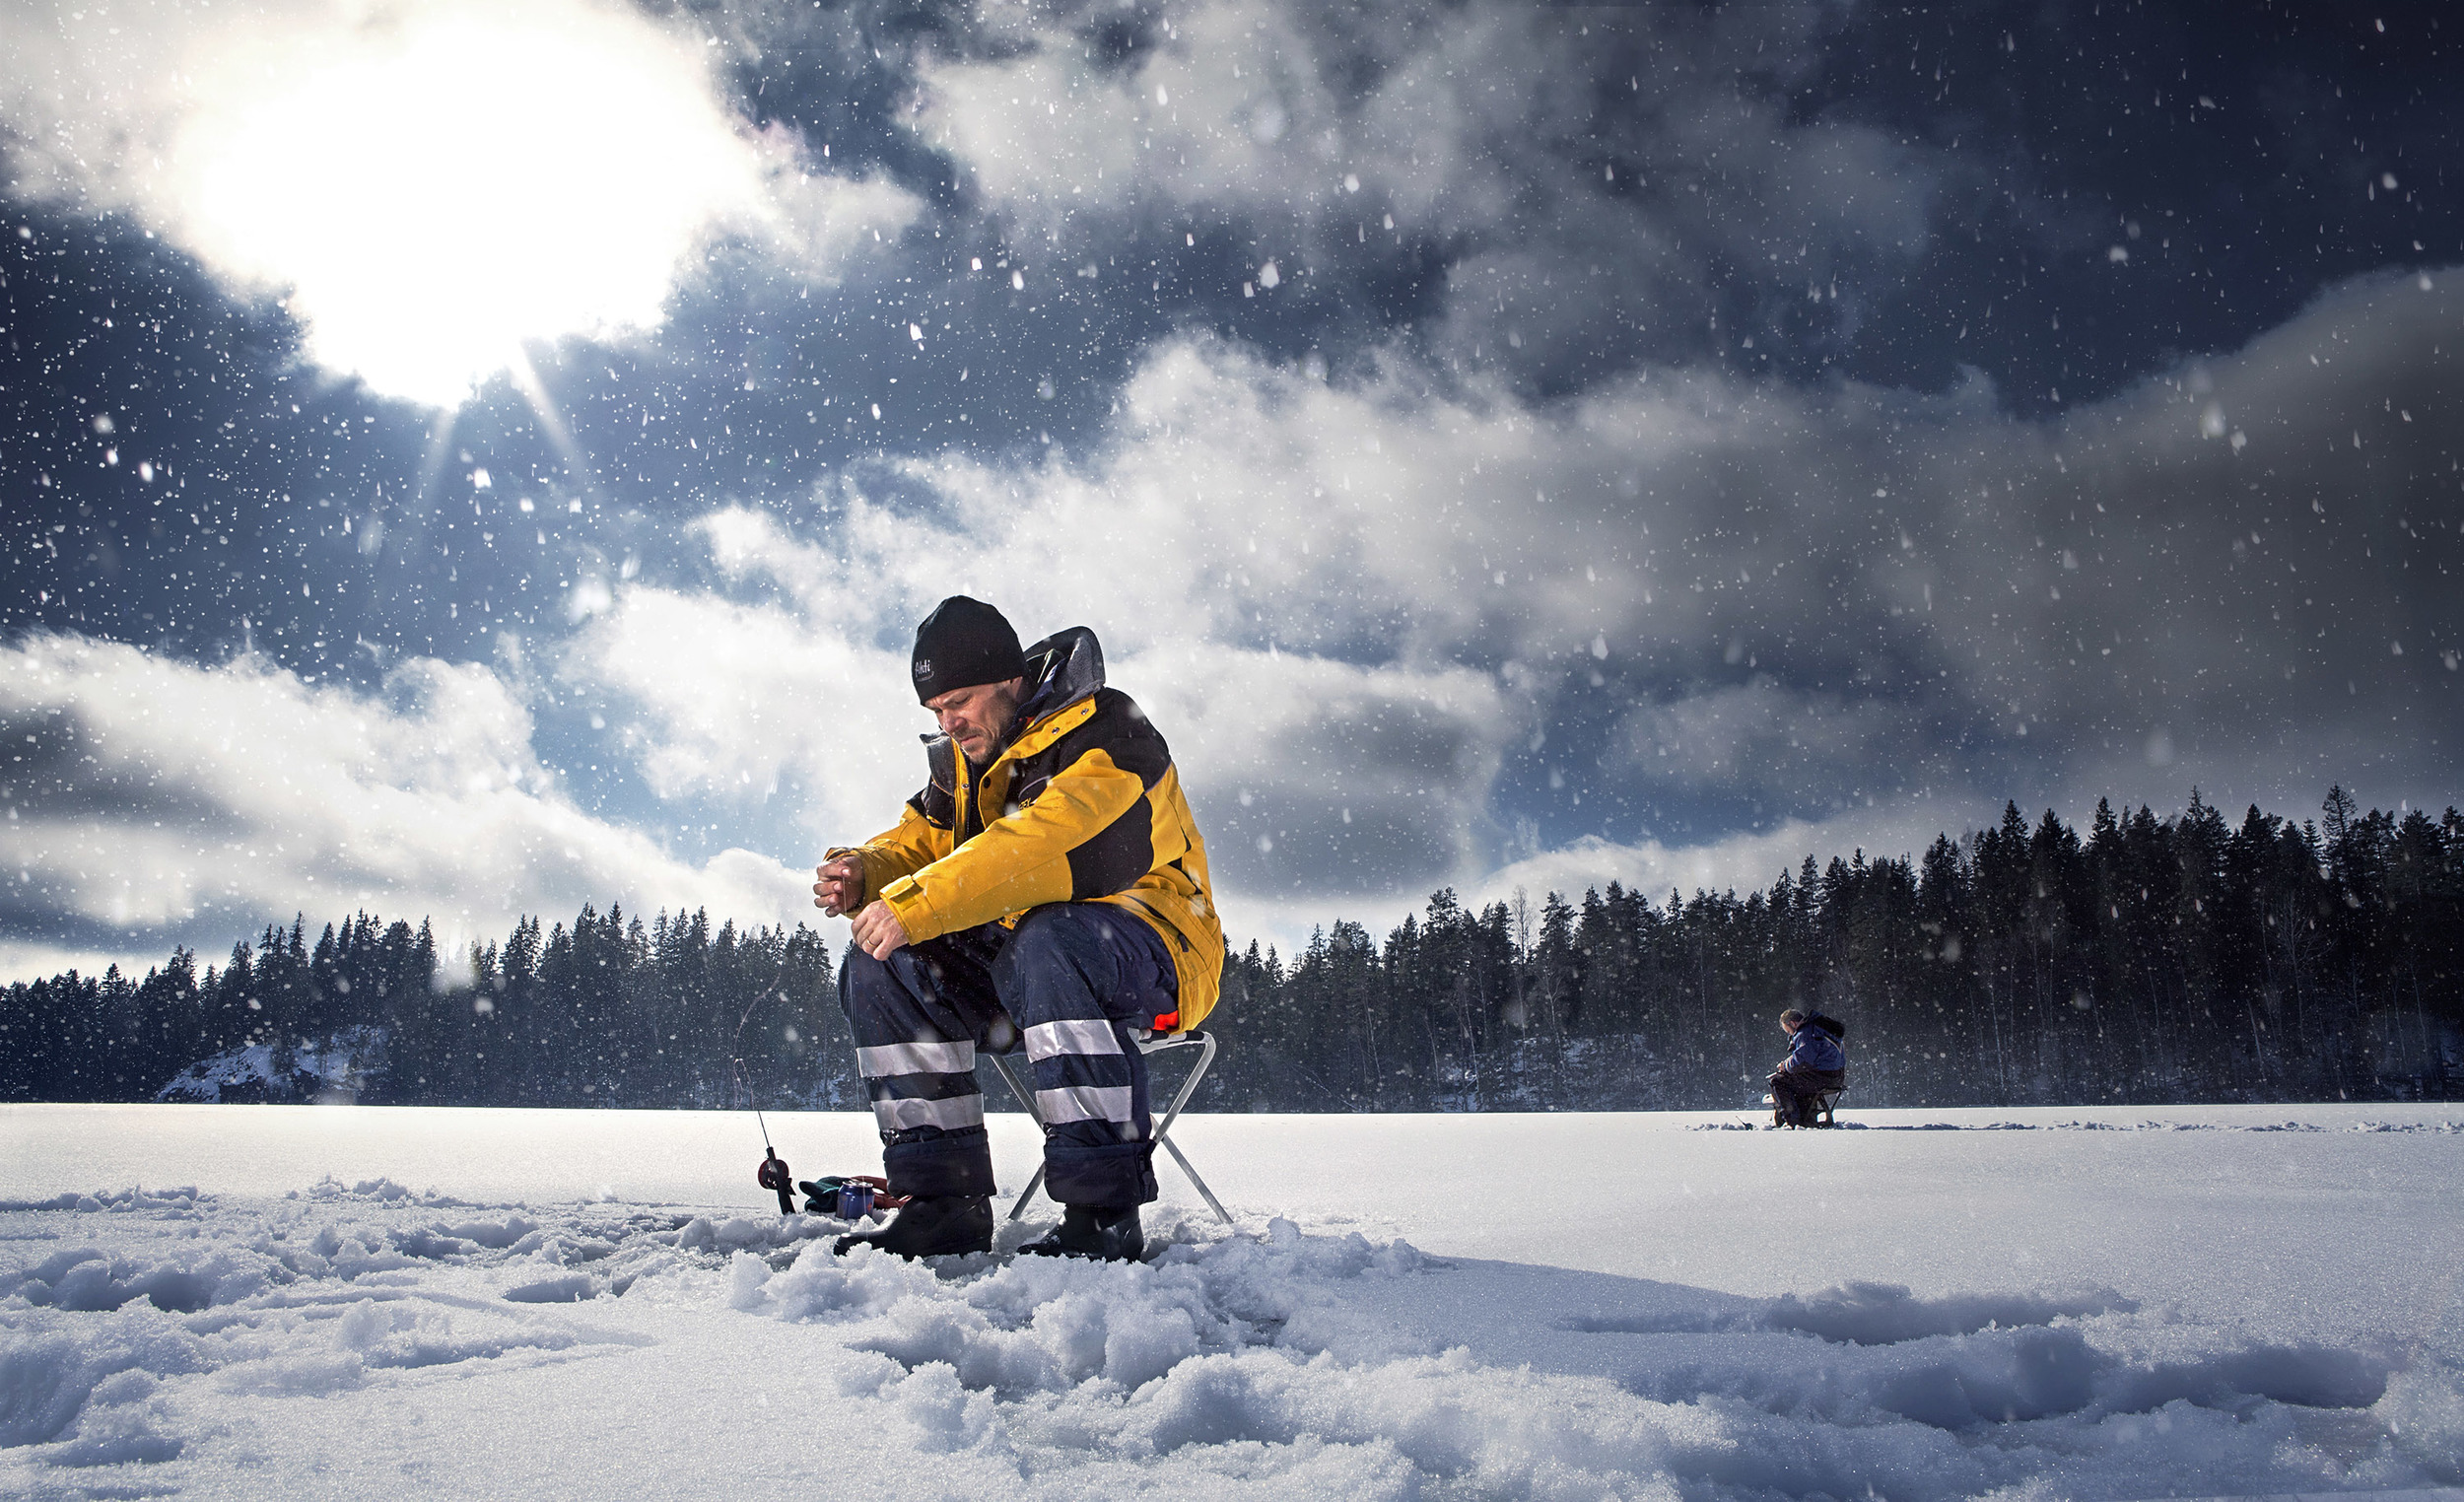 icefishing0001.jpg